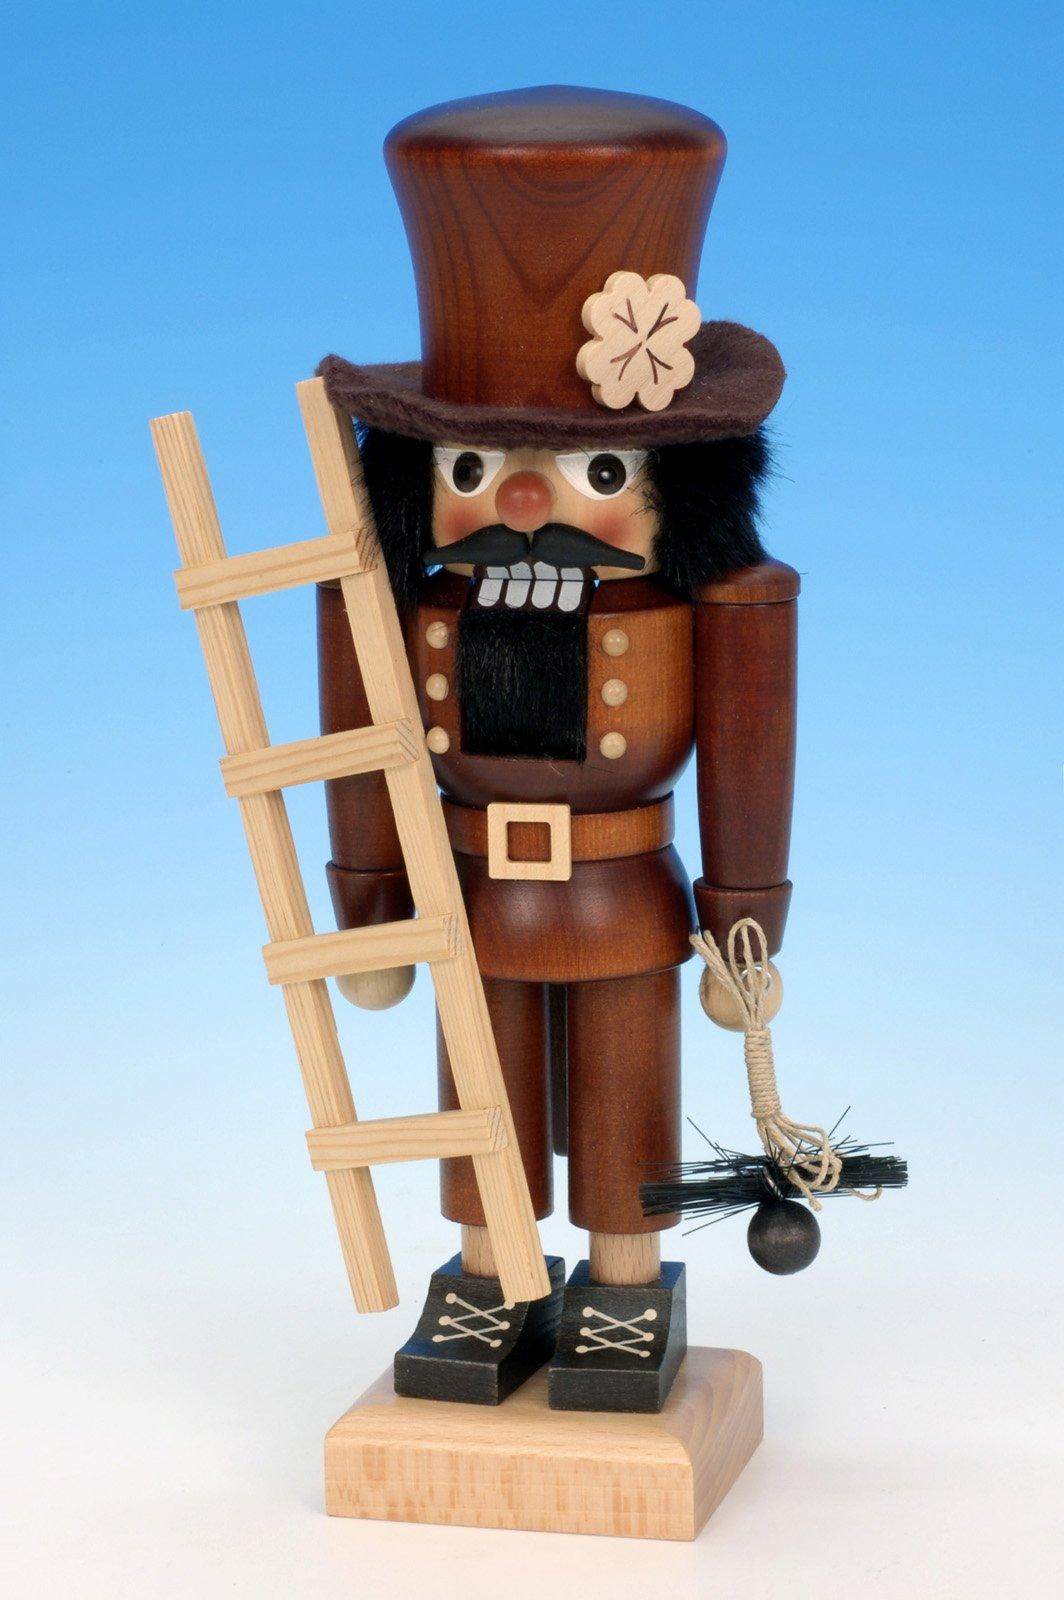 German Christmas Nutcracker Chimney sweep natural colour - 26,5cm / 10 inches - Christian Ulbricht